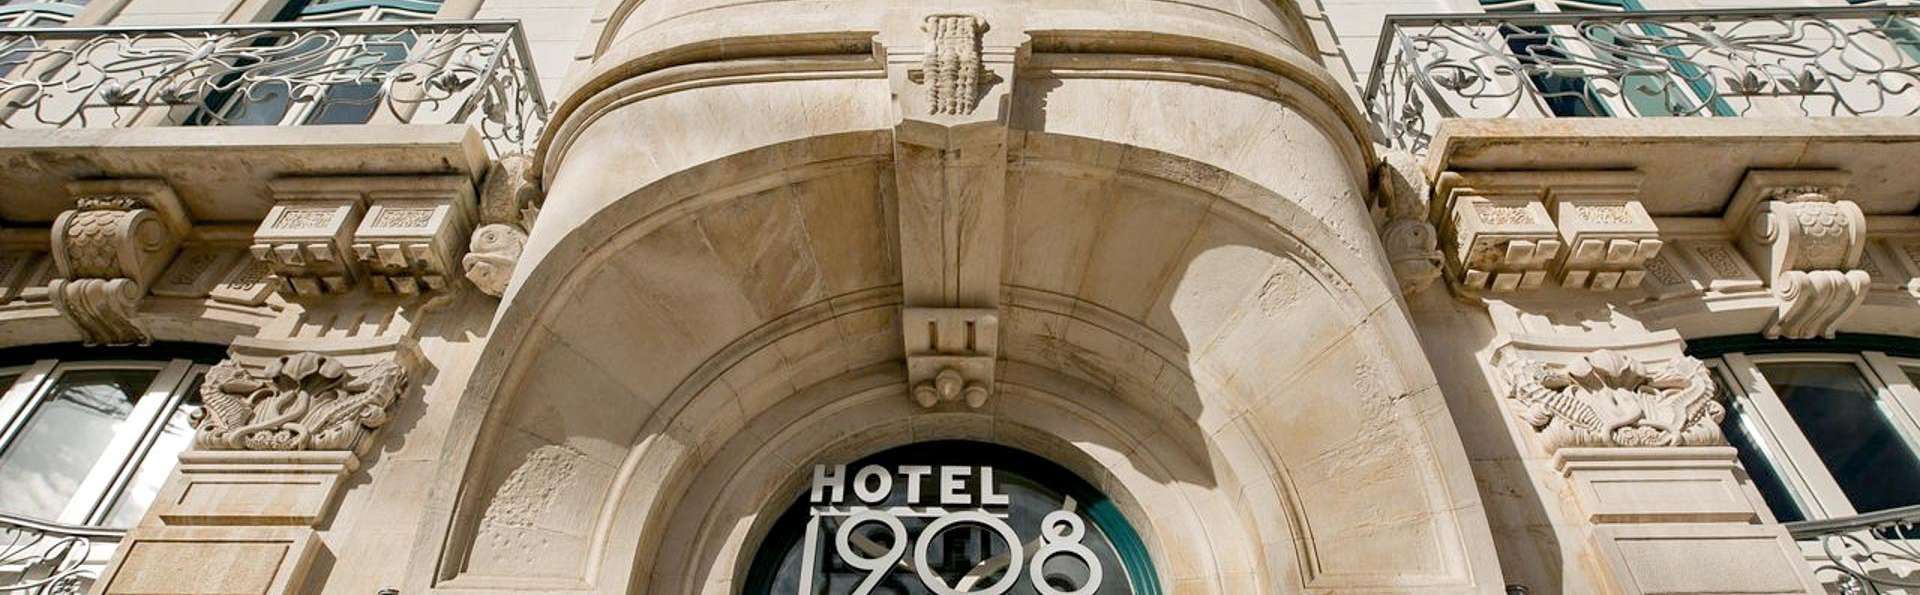 1908 Lisboa Hotel - EDIT_FRONT_02.jpg